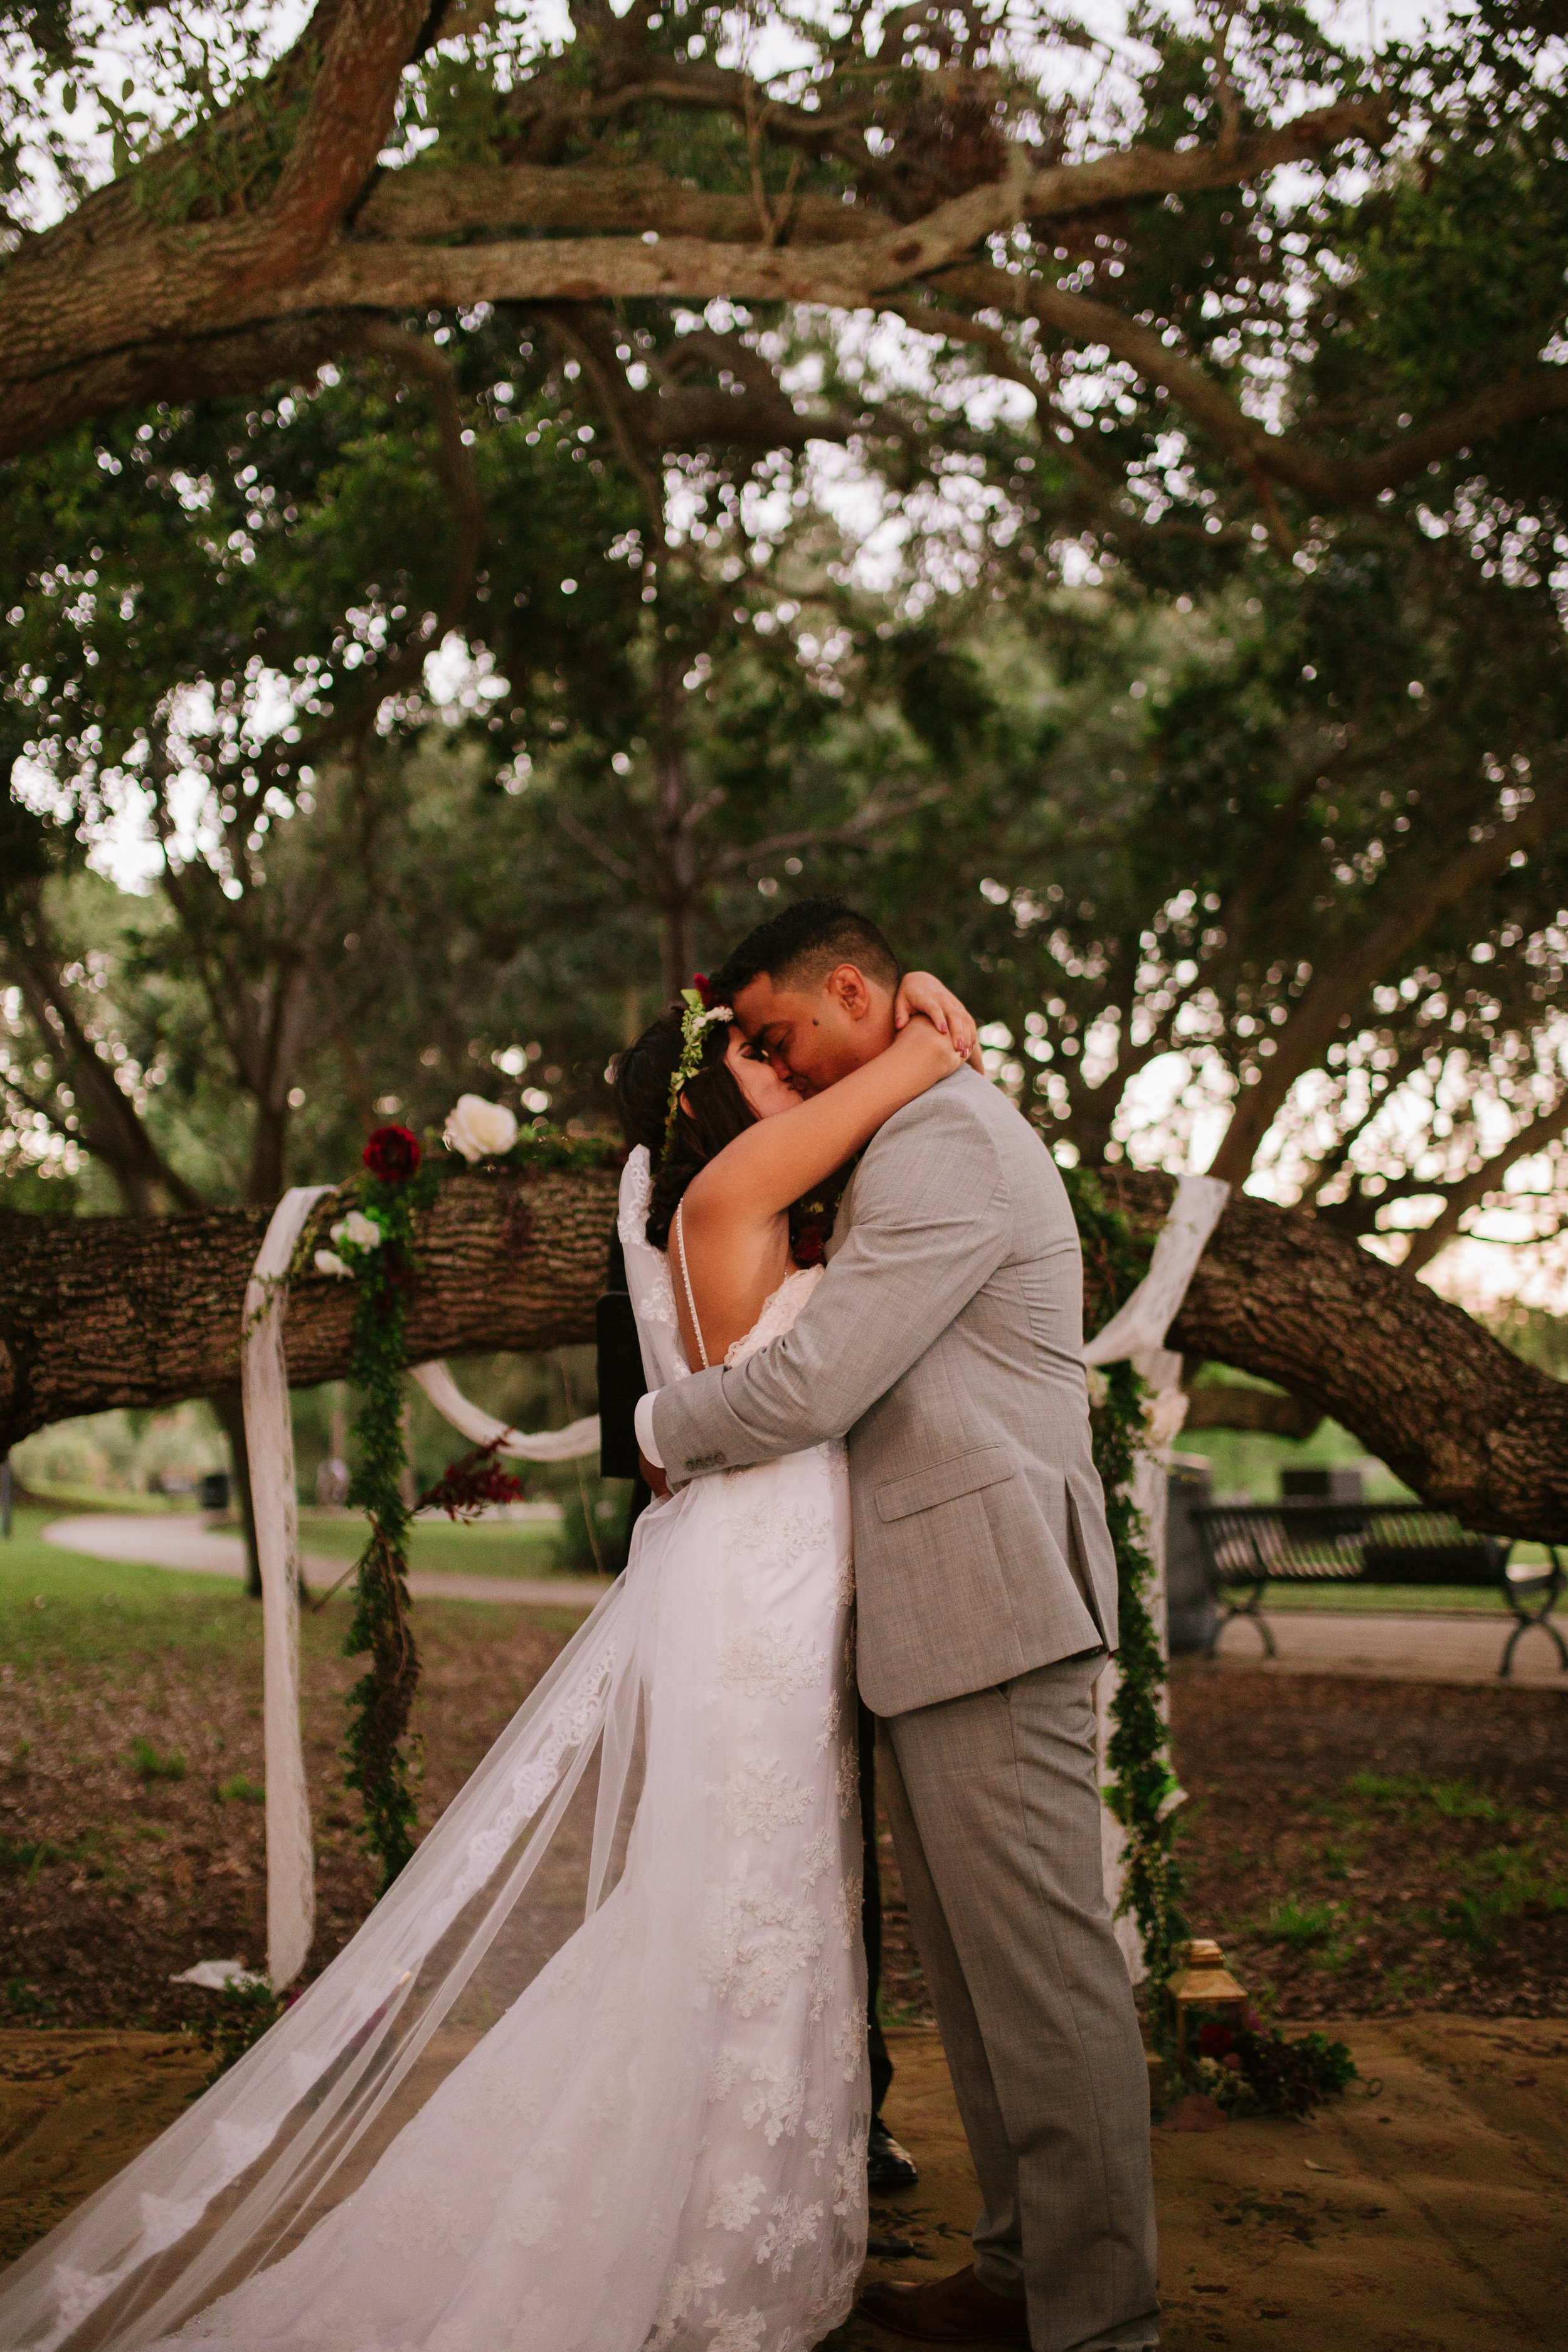 2017.05.23 Barbara and Mauricio Sales Port St Lucie Wedding (435 of 772).jpg